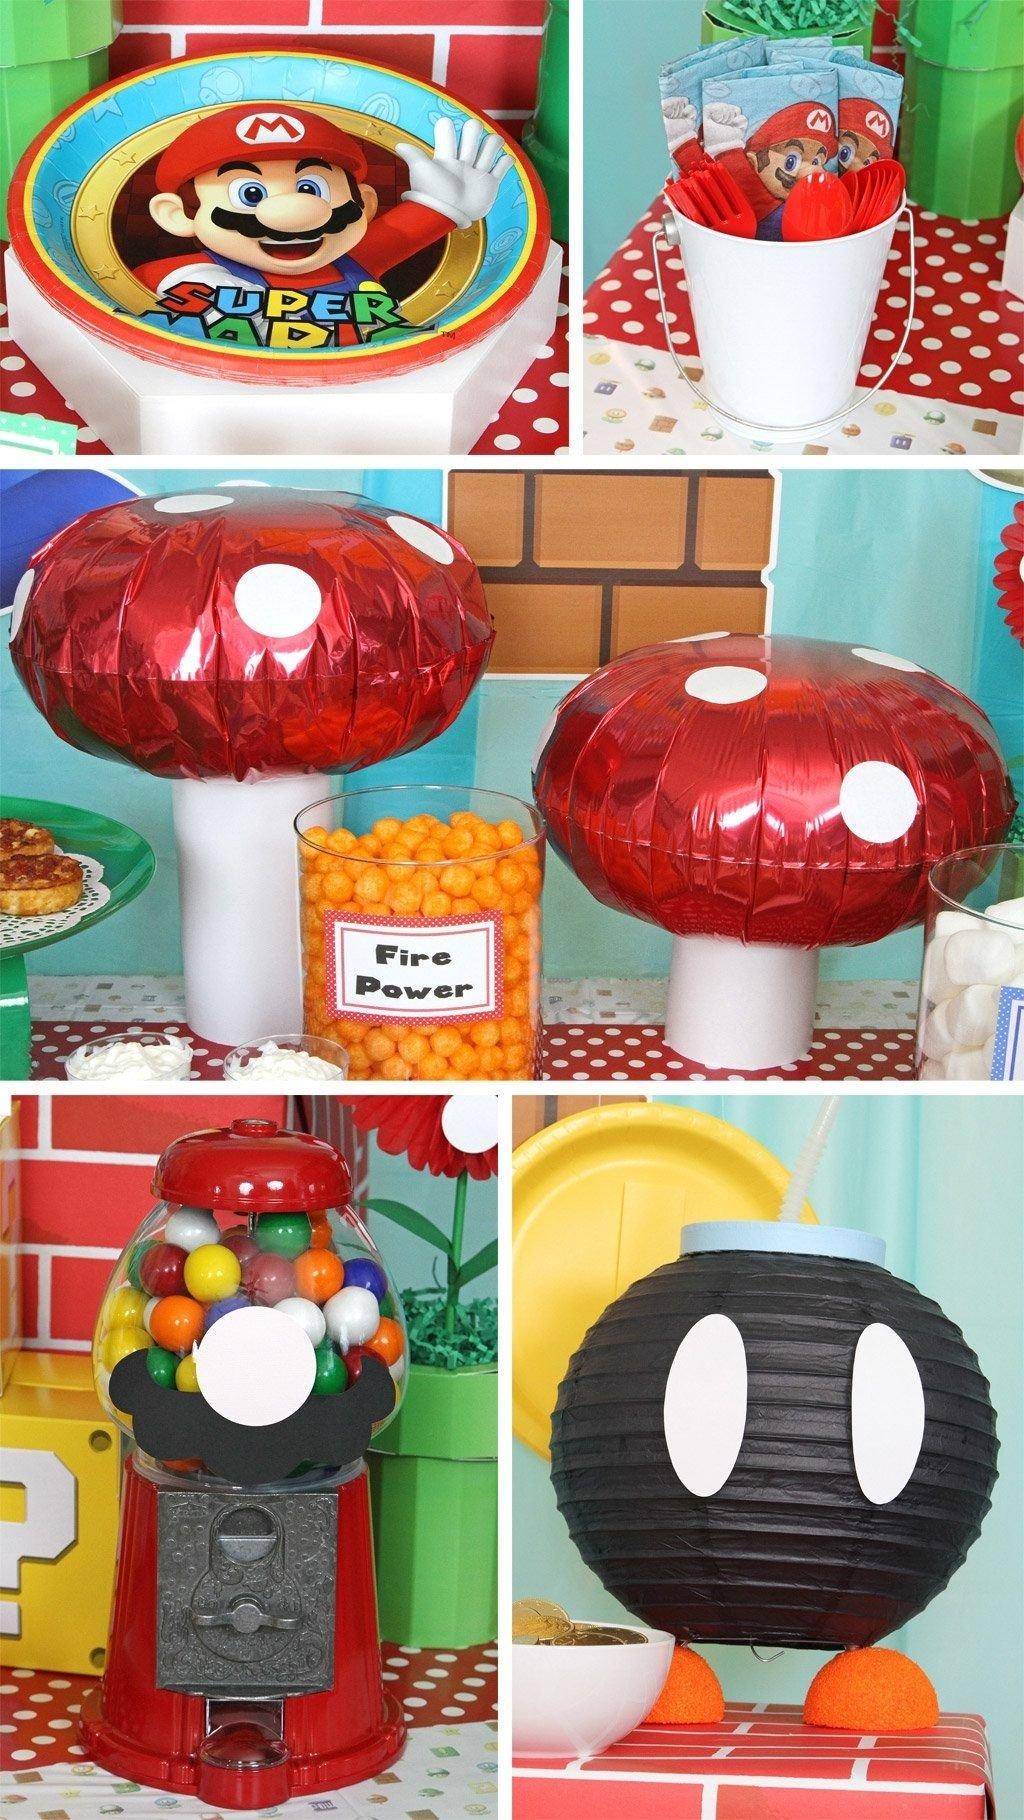 10 Famous Super Mario Bros Party Ideas super mario bros party ideas festa pinterest super mario bros 2021